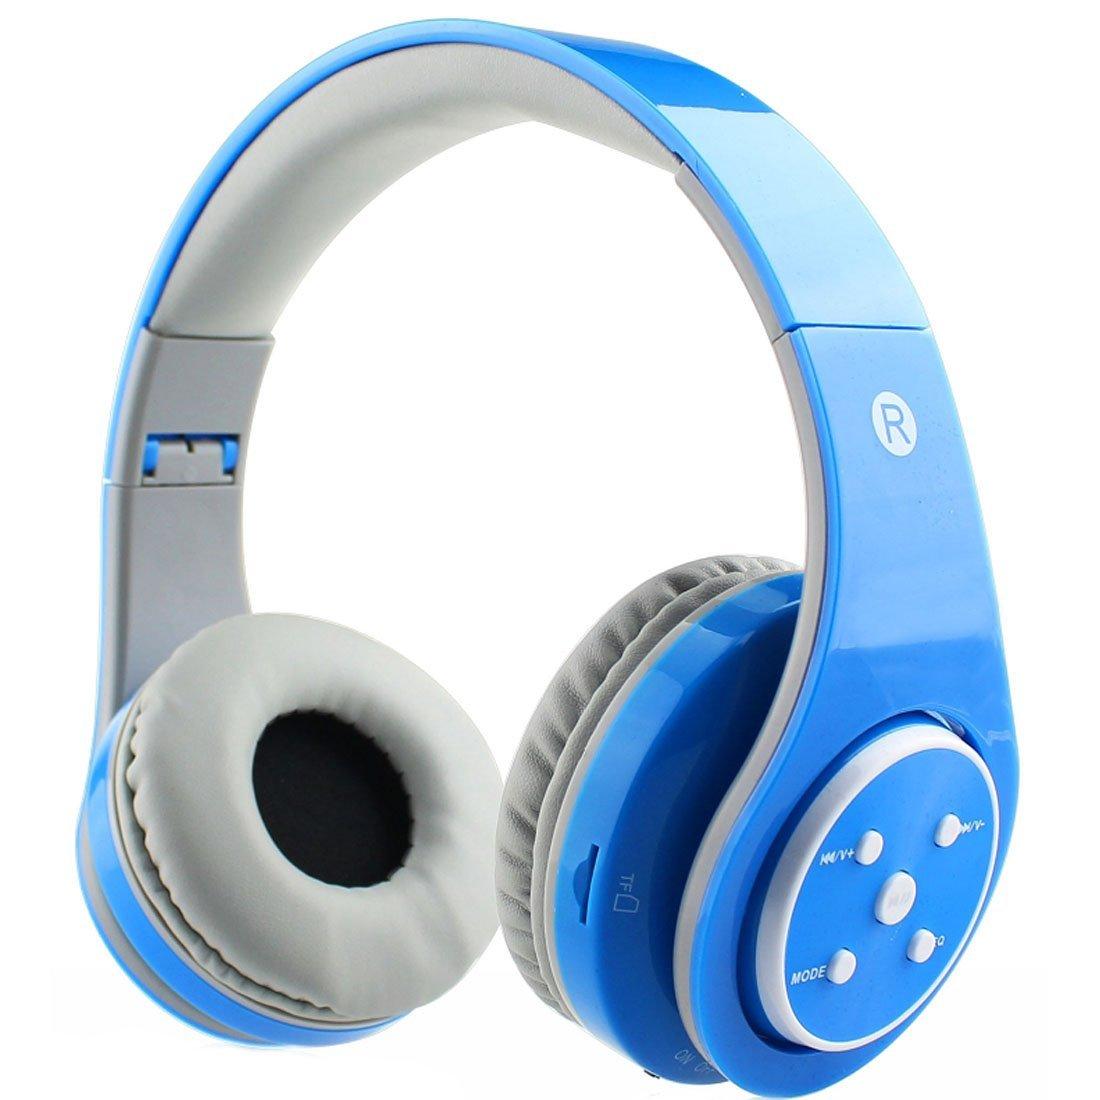 B06 auriculares Bluetooth inalámbricos oído plegable auriculares AUX 3,5mm Jack Cable de ranura para tarjeta SD construido-en el Mic micrófono equipo